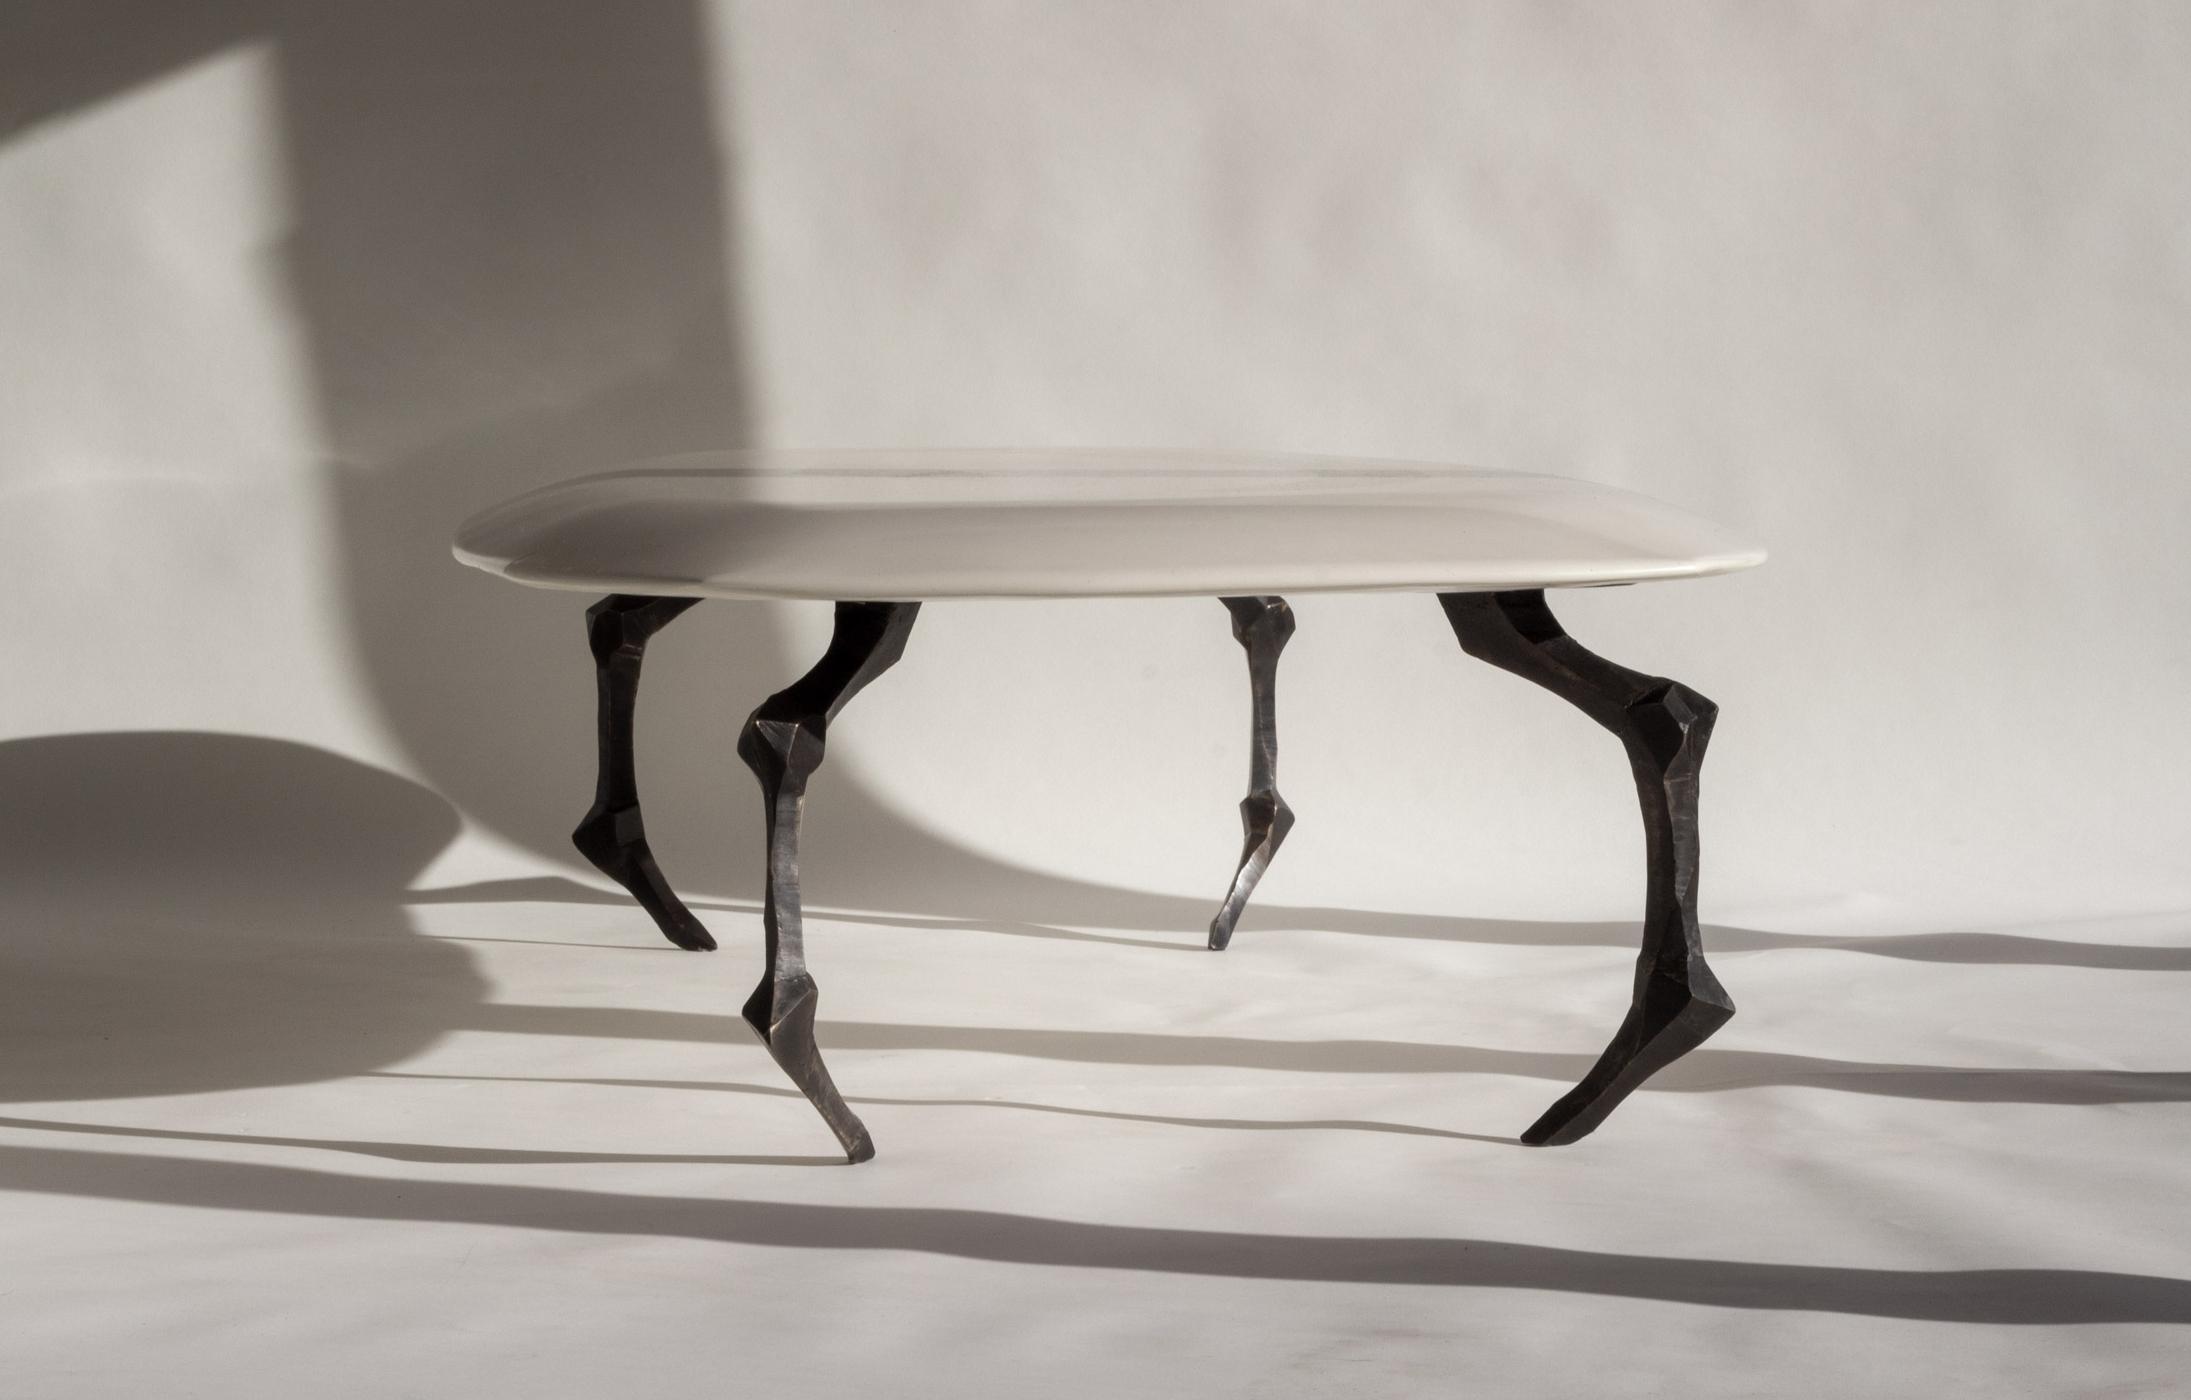 JAK-Creature-Tables-2018-1184.jpg